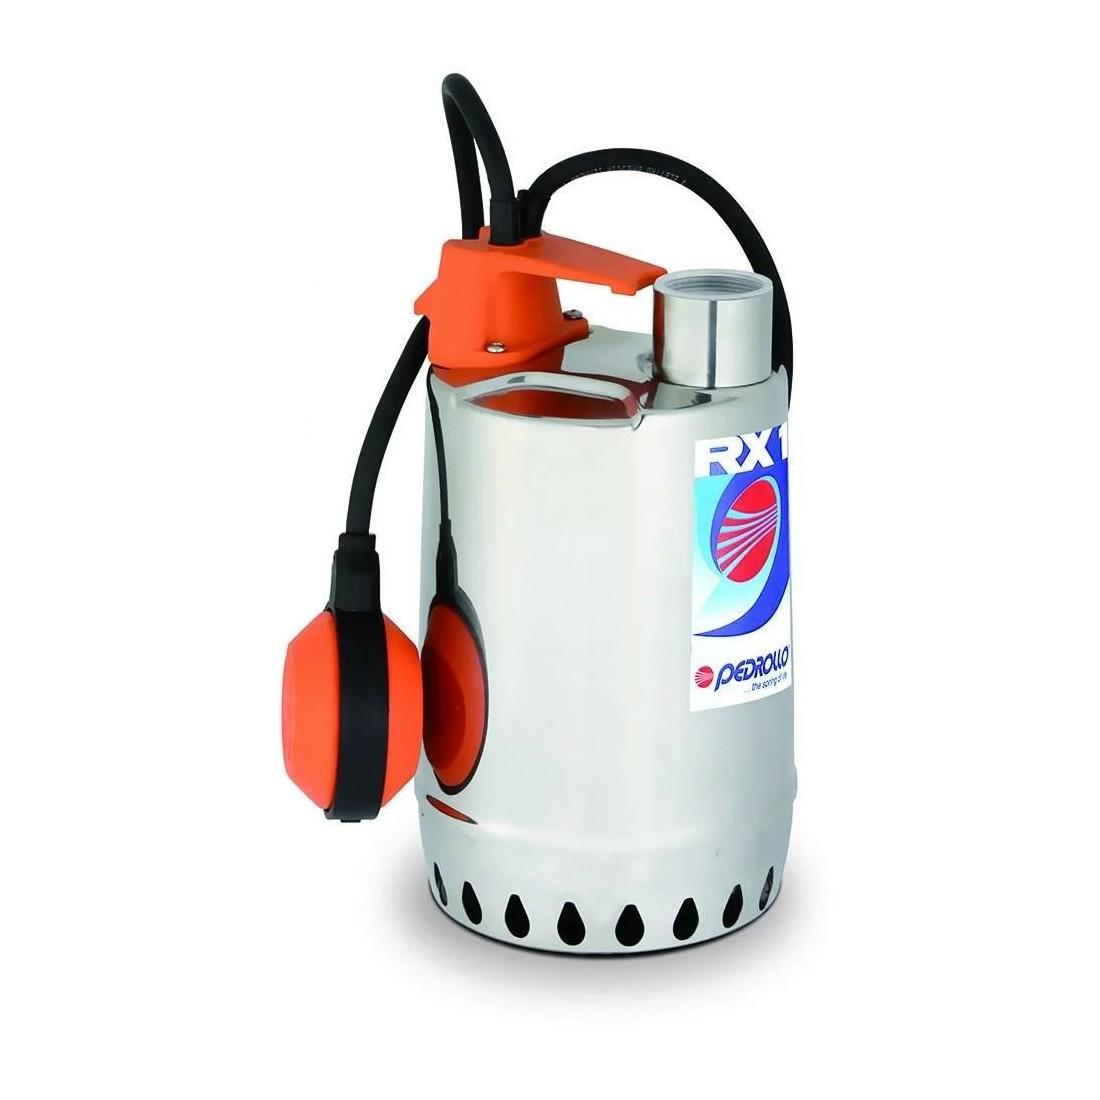 Pompa submersibila apa usor murdara cu plutitor magnetic Pedrollo RXm 2-GM monofazata